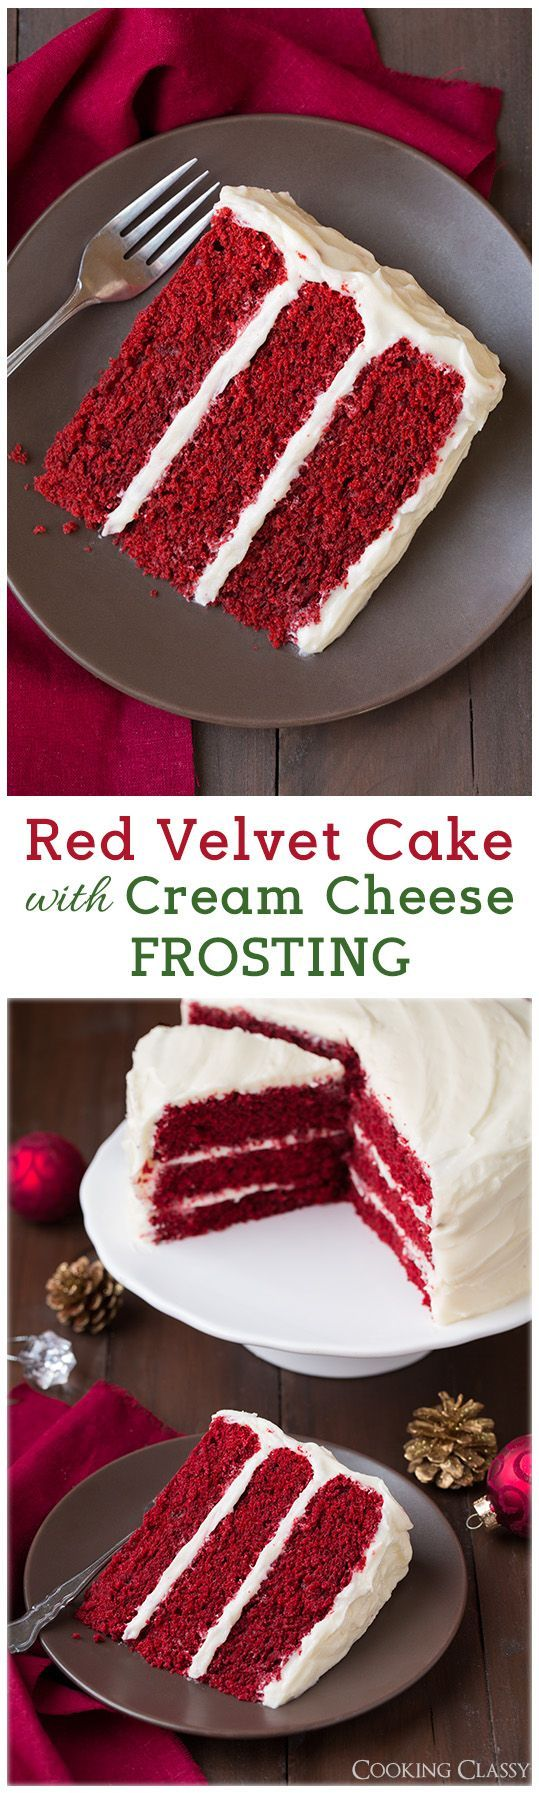 cake red velvet cake red velvet cake red velvet cake i red velvet cake ...